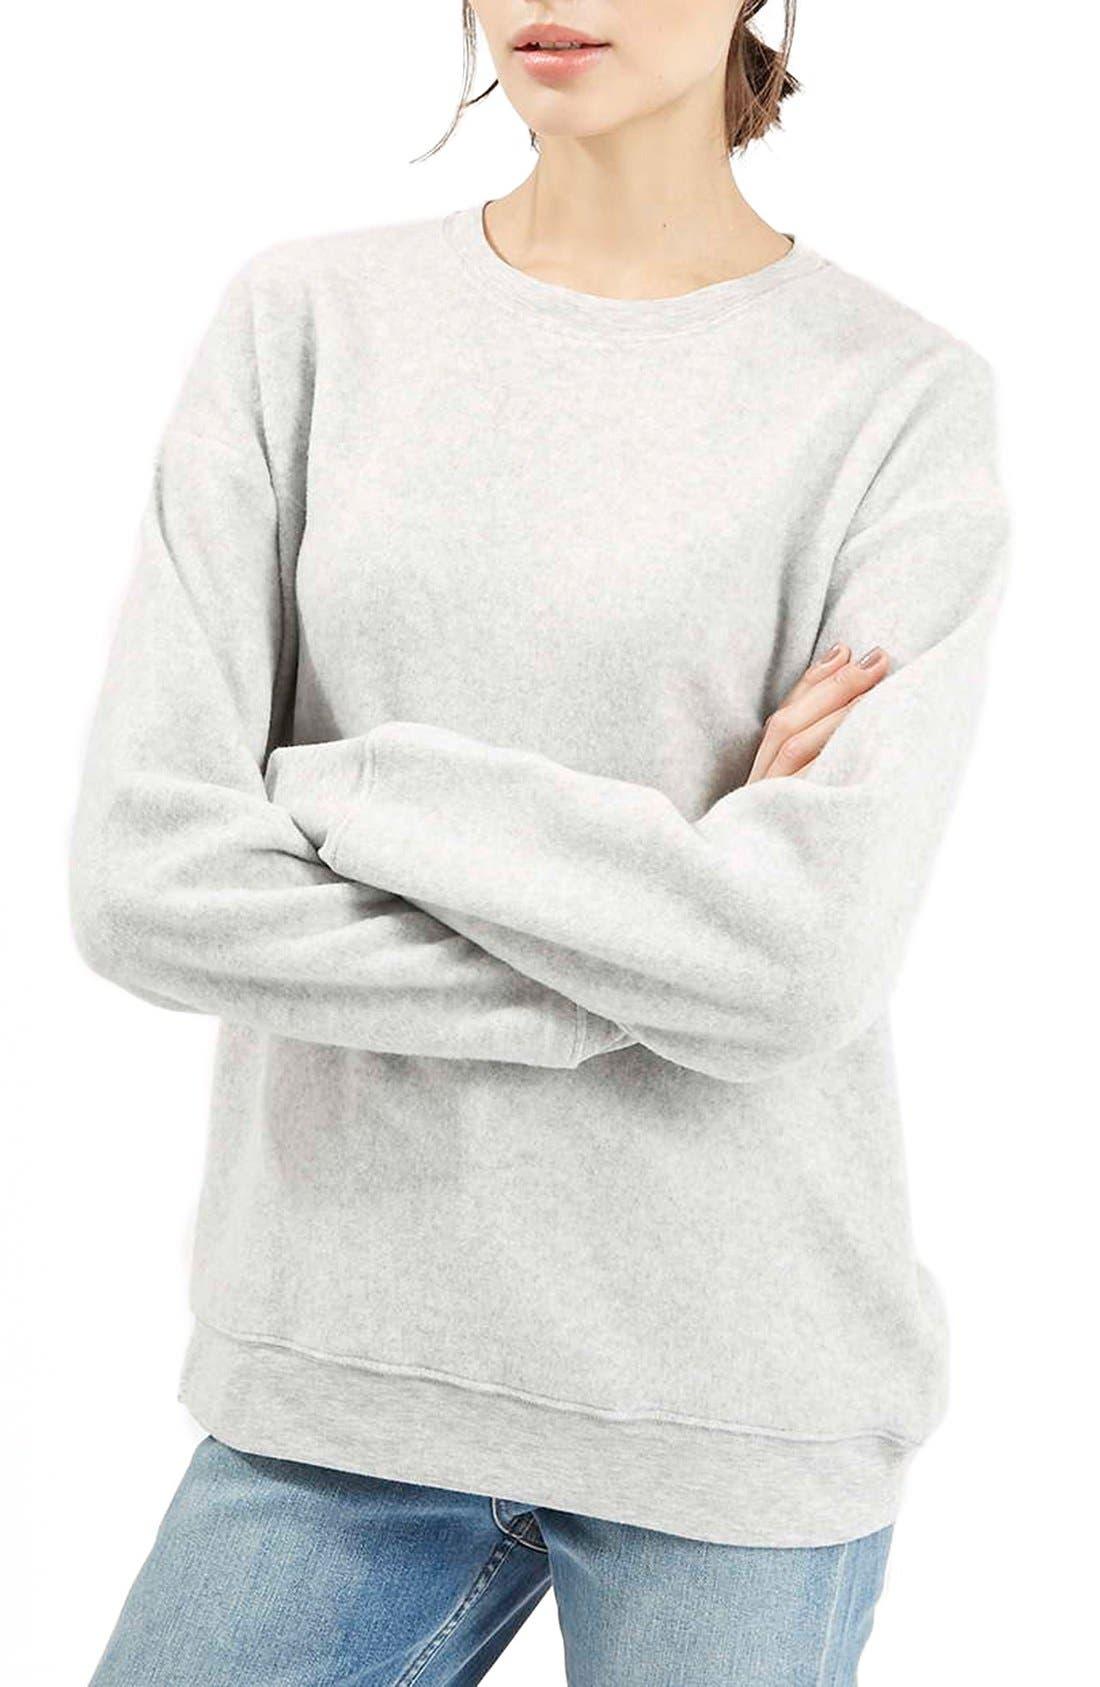 Alternate Image 1 Selected - Topshop BrushedCrewneck Sweatshirt